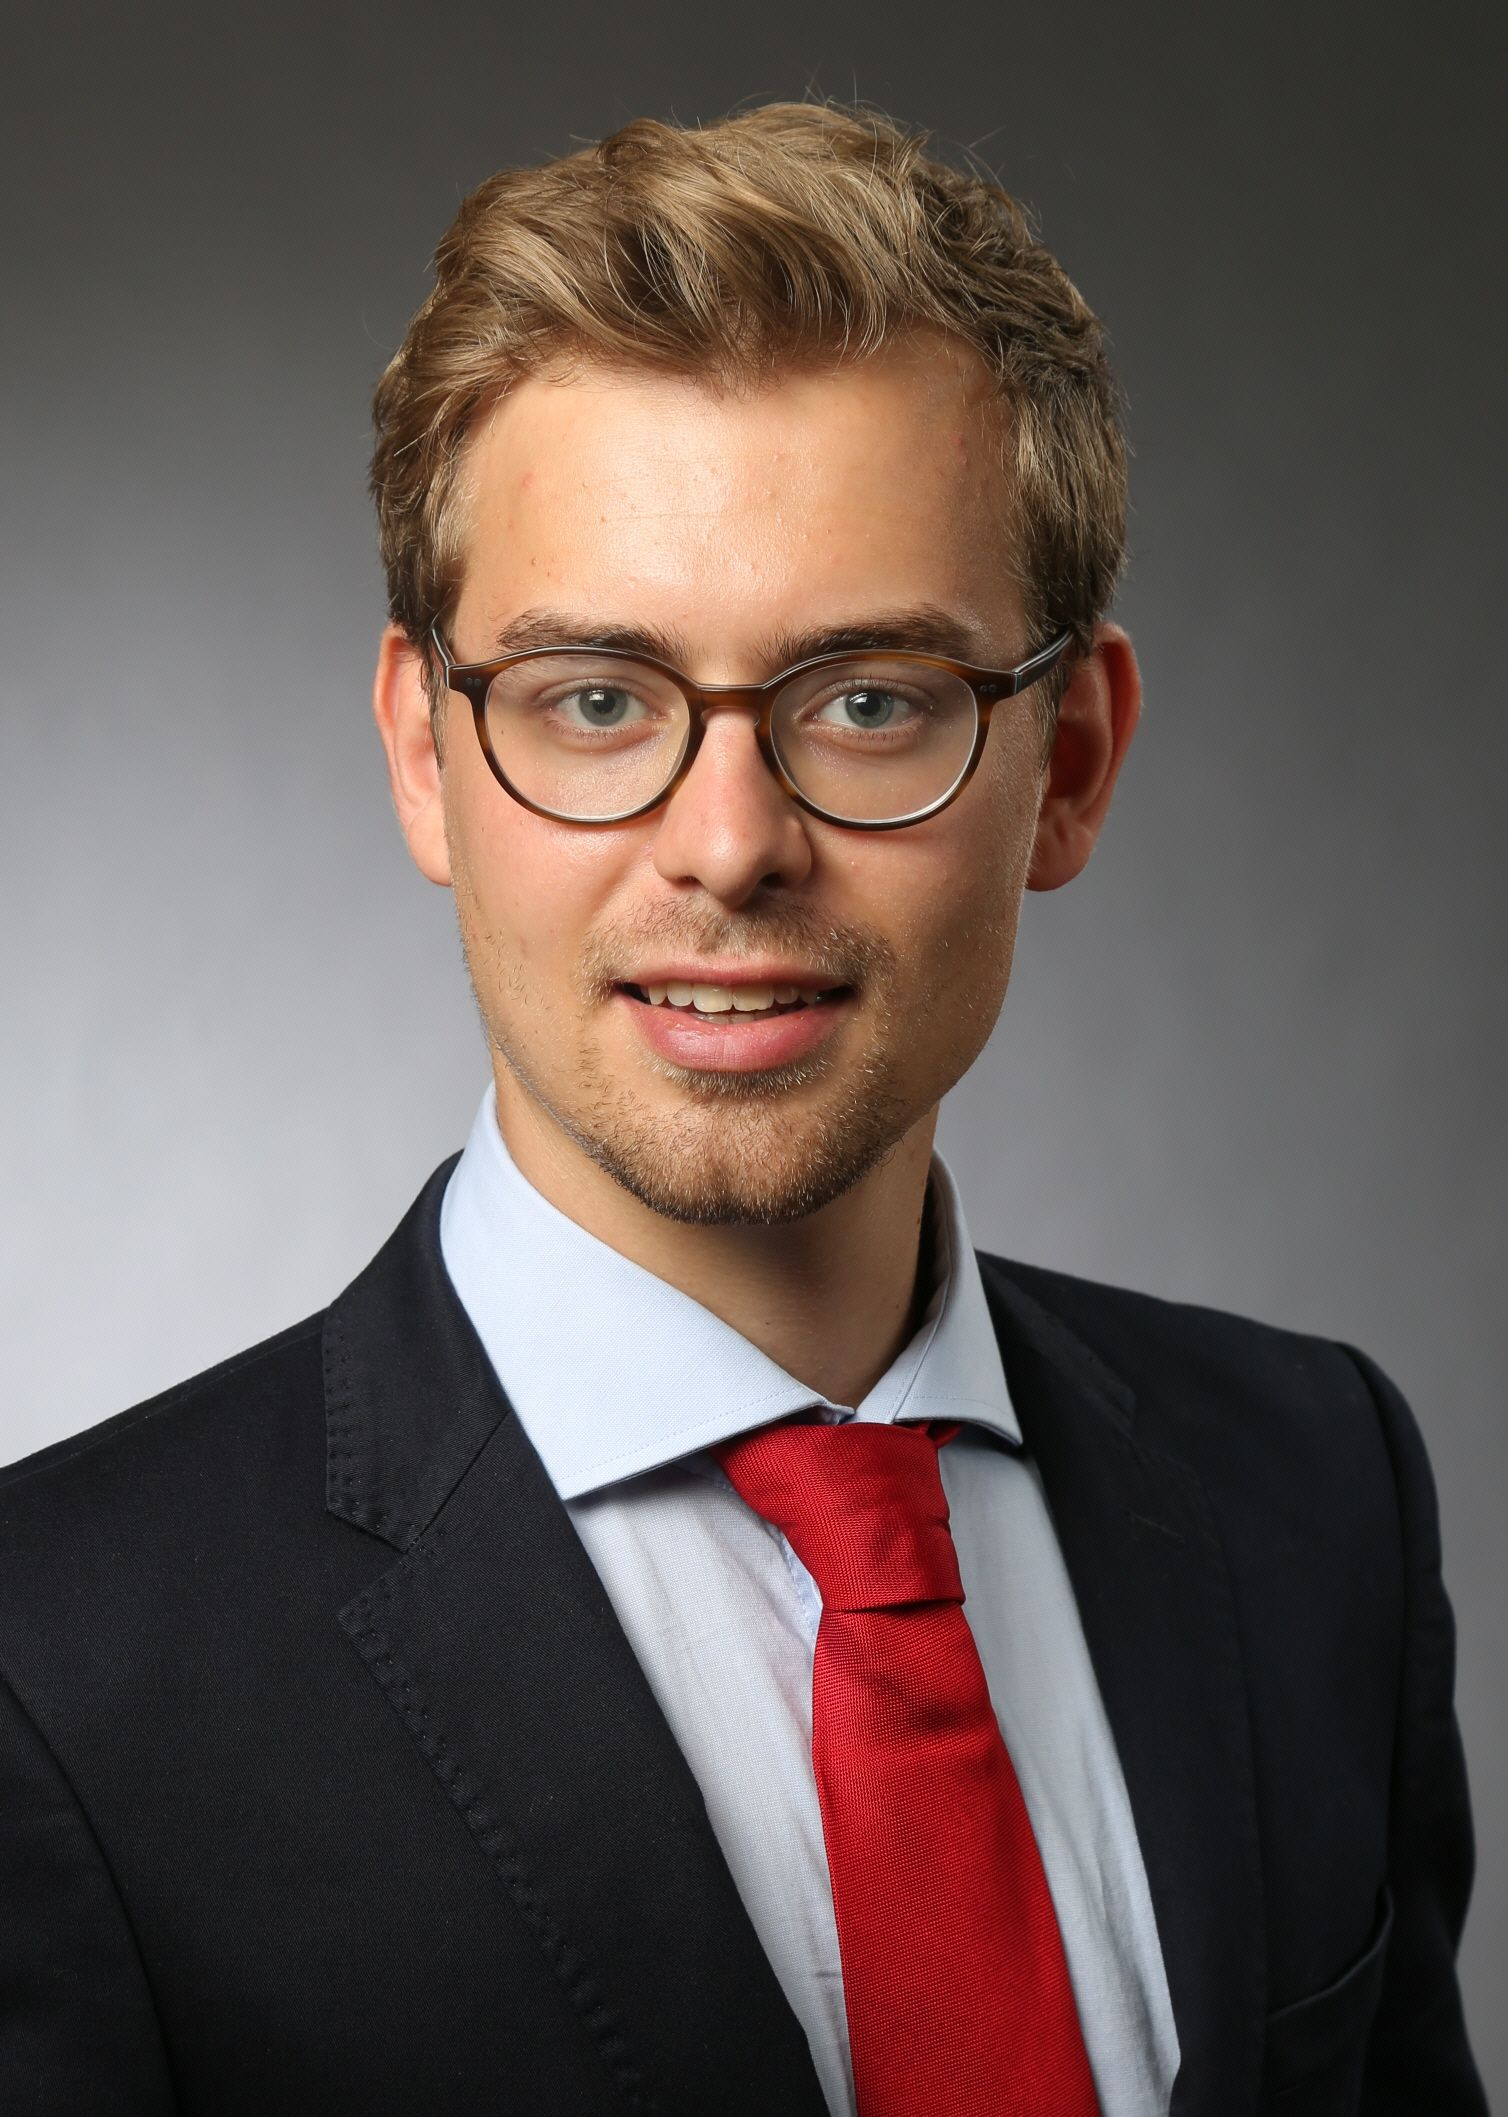 Jan-Niklas_CV-Picture